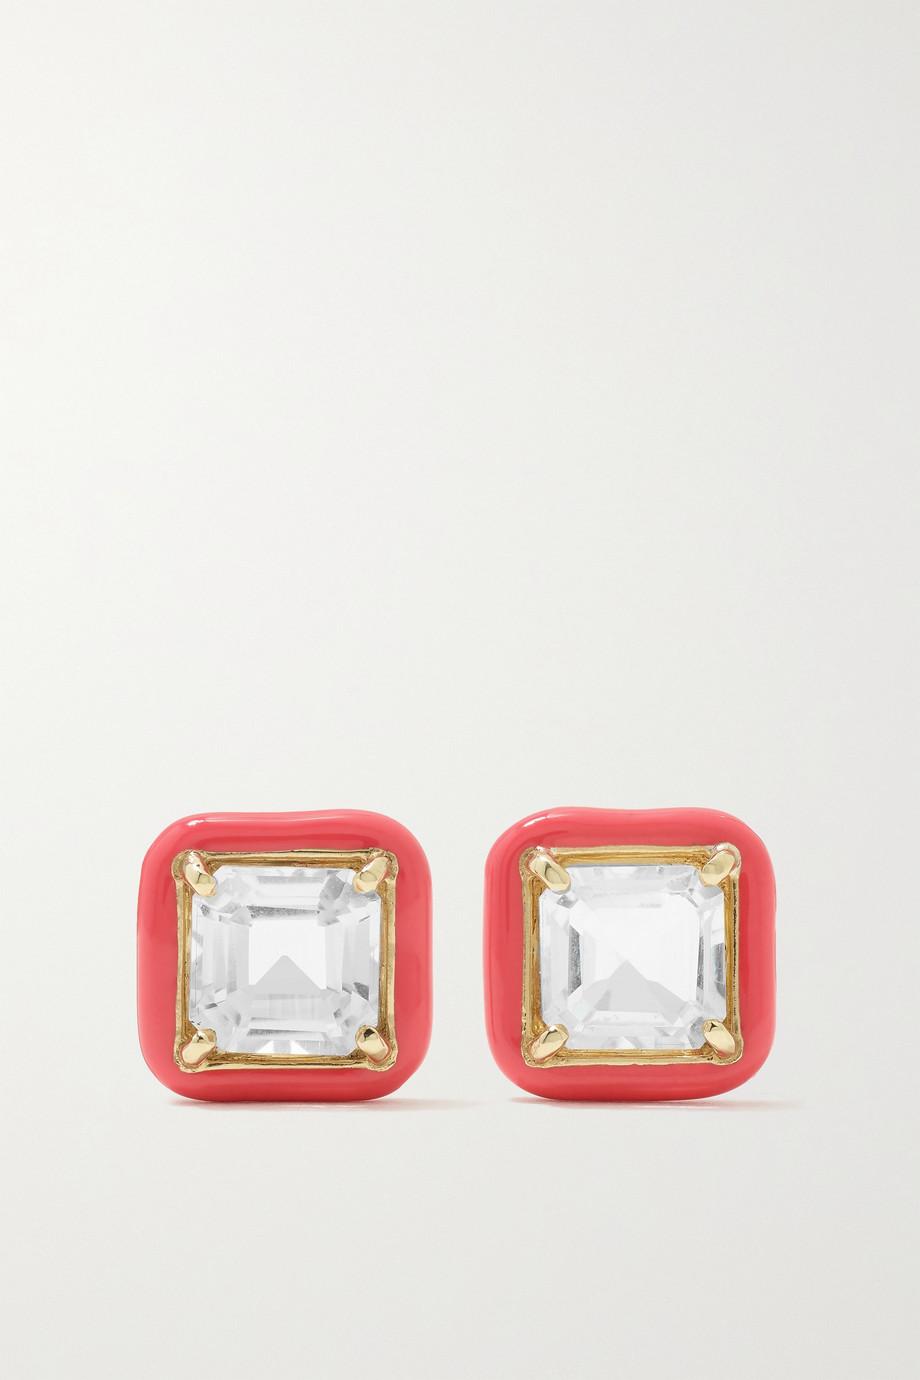 Bea Bongiasca Candy Square 9-karat gold, enamel and topaz earrings